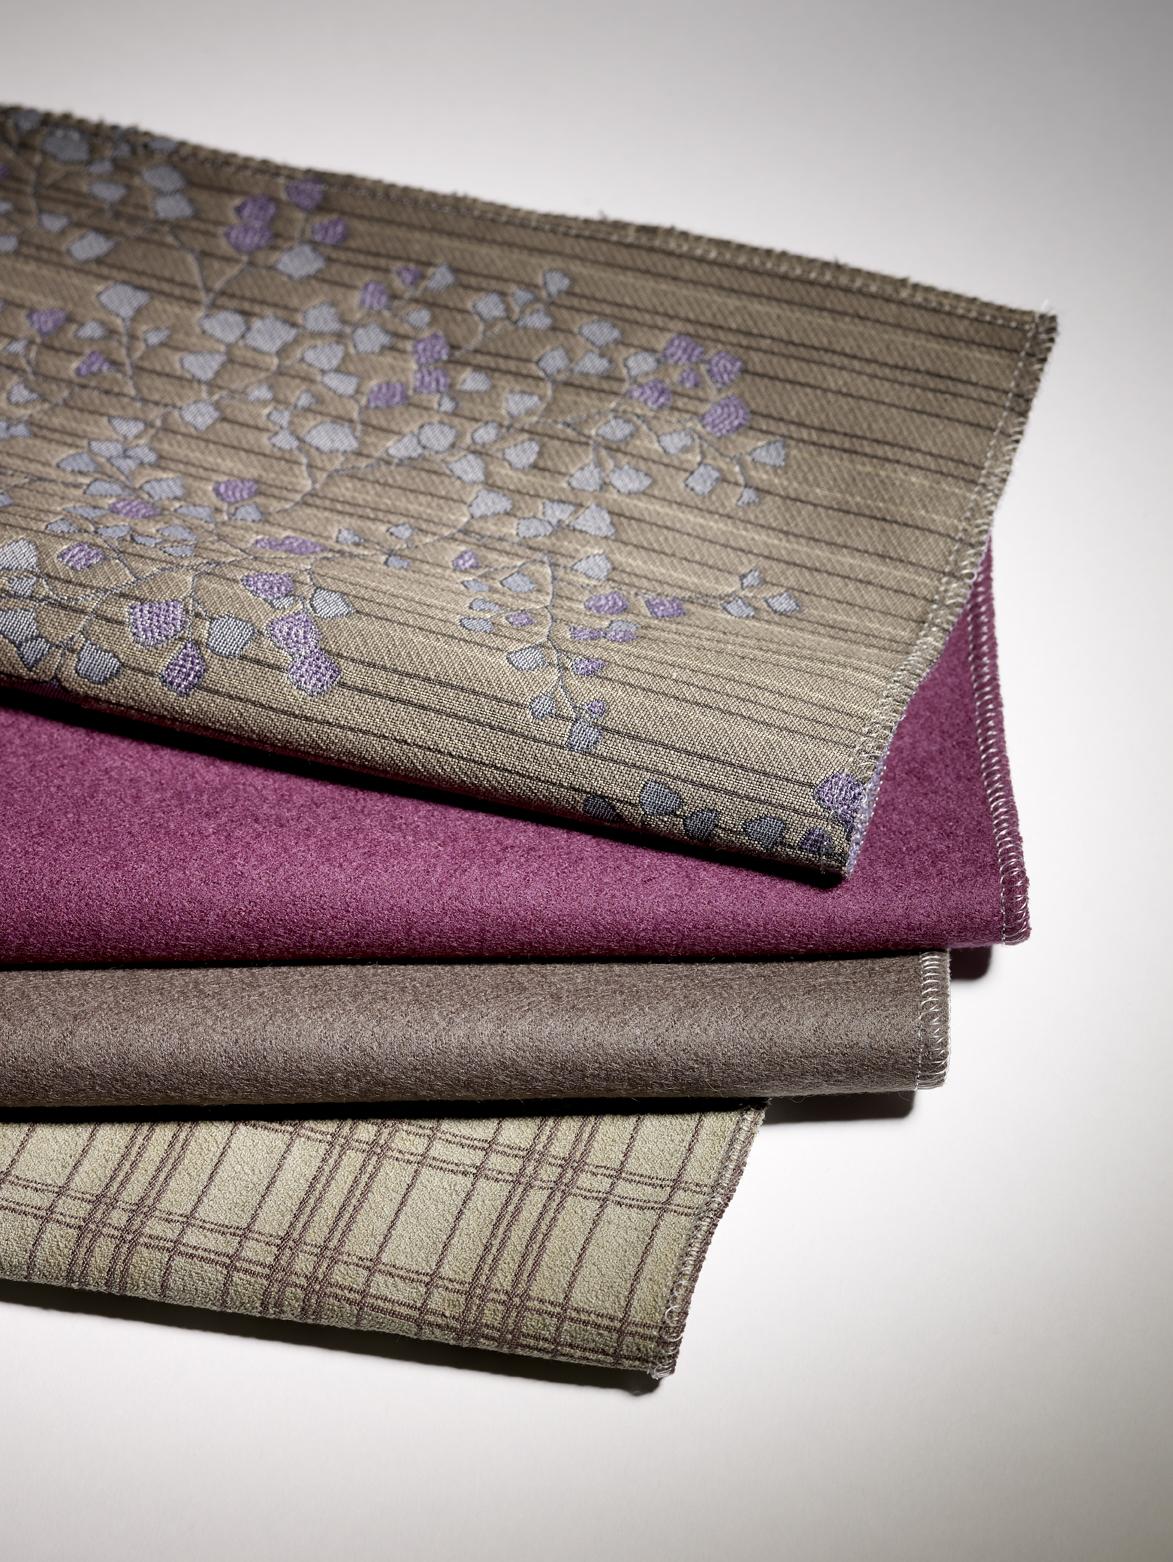 Kimono Design Patterns